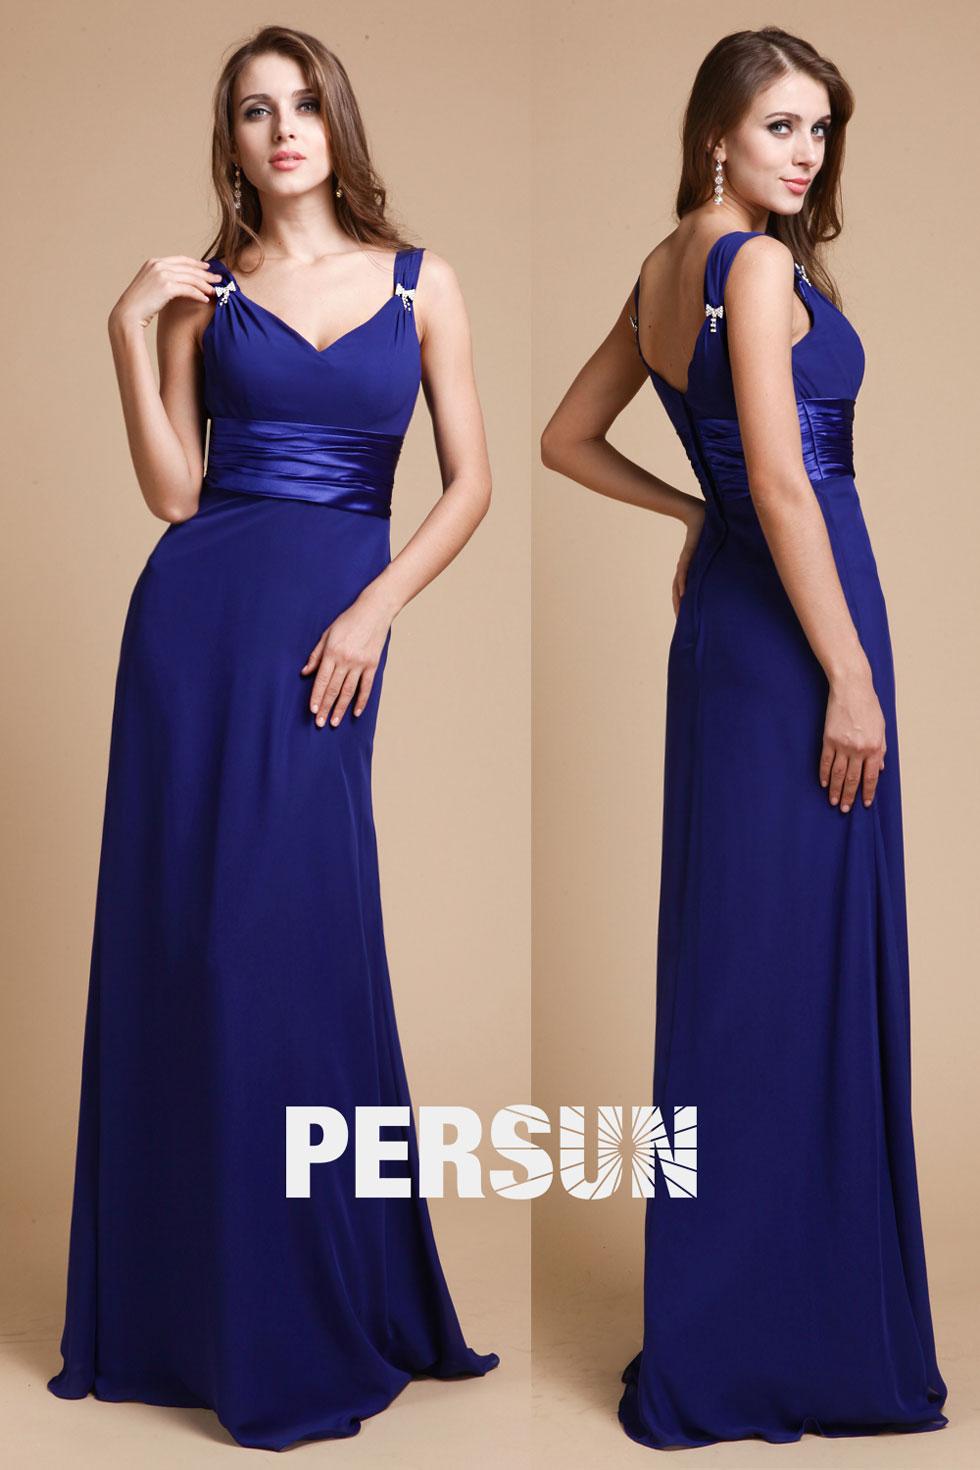 robe de soirée simple en bleu roi pas cher pour mariage